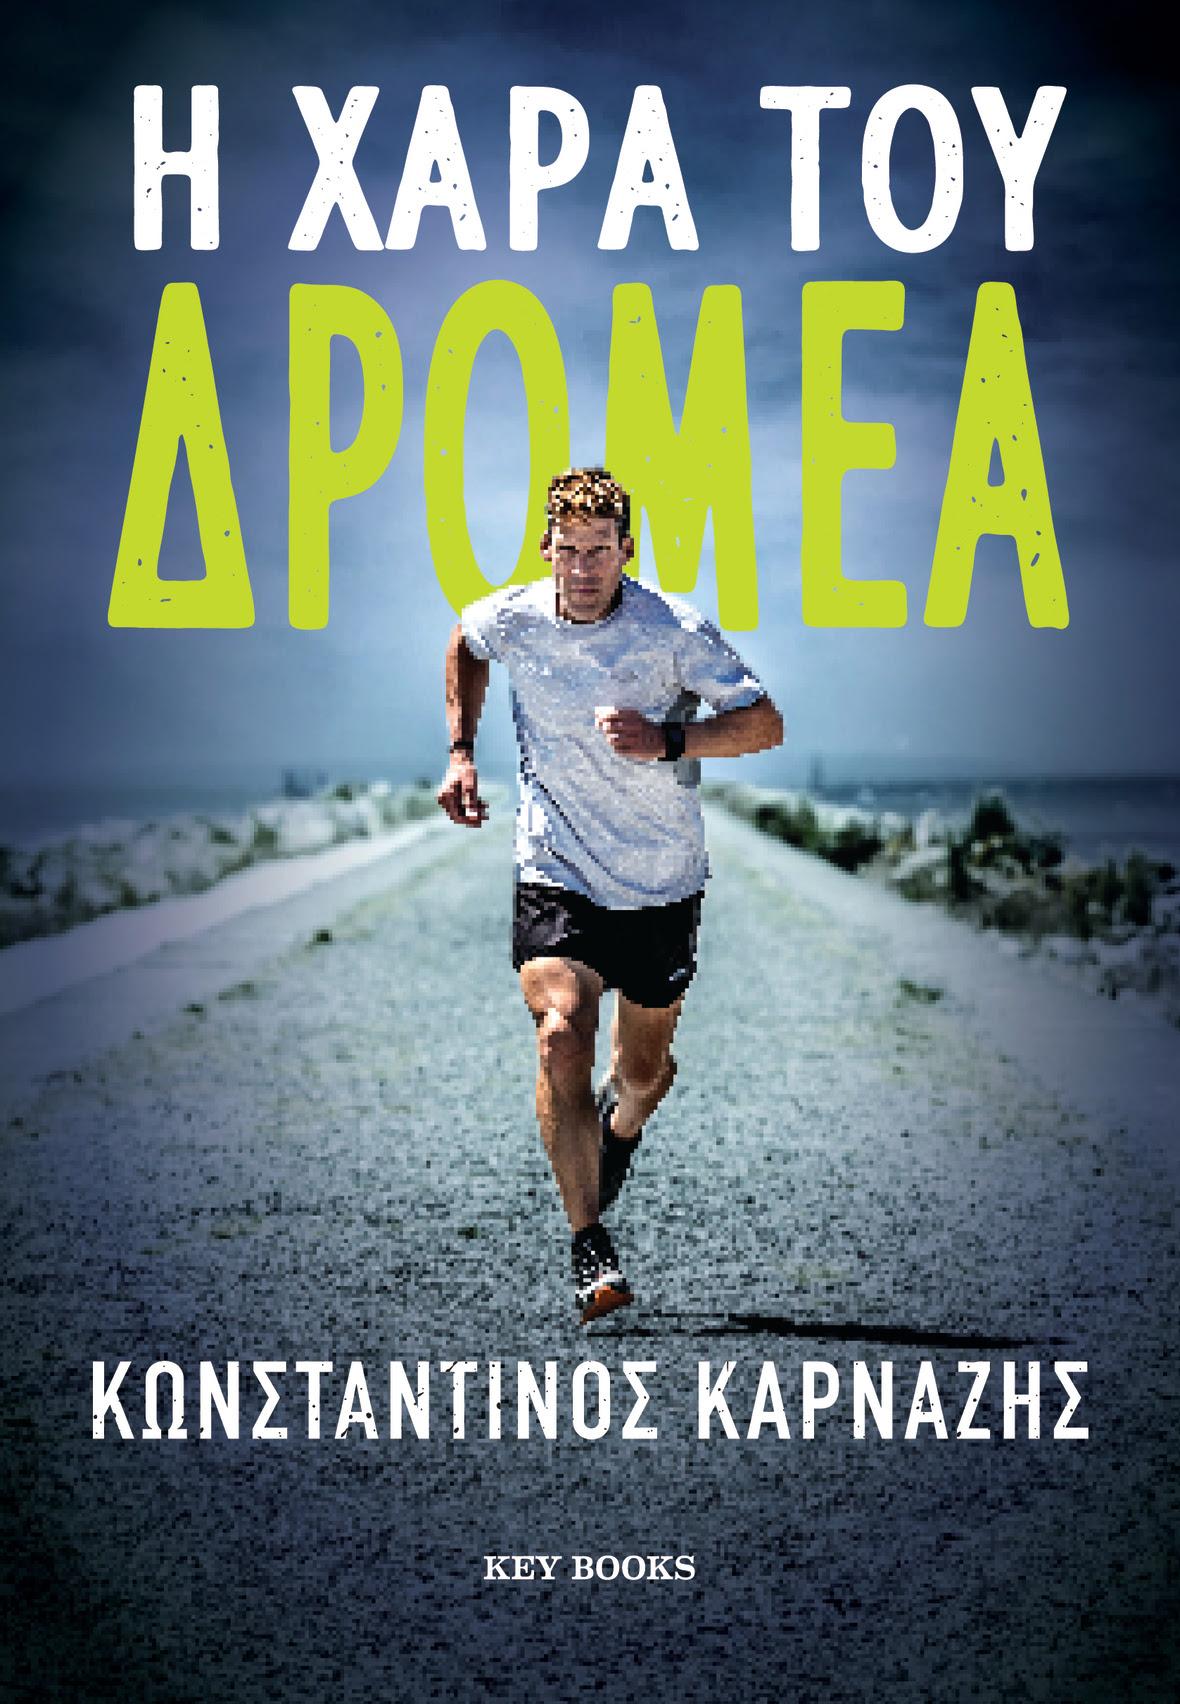 XaraDromea Cover